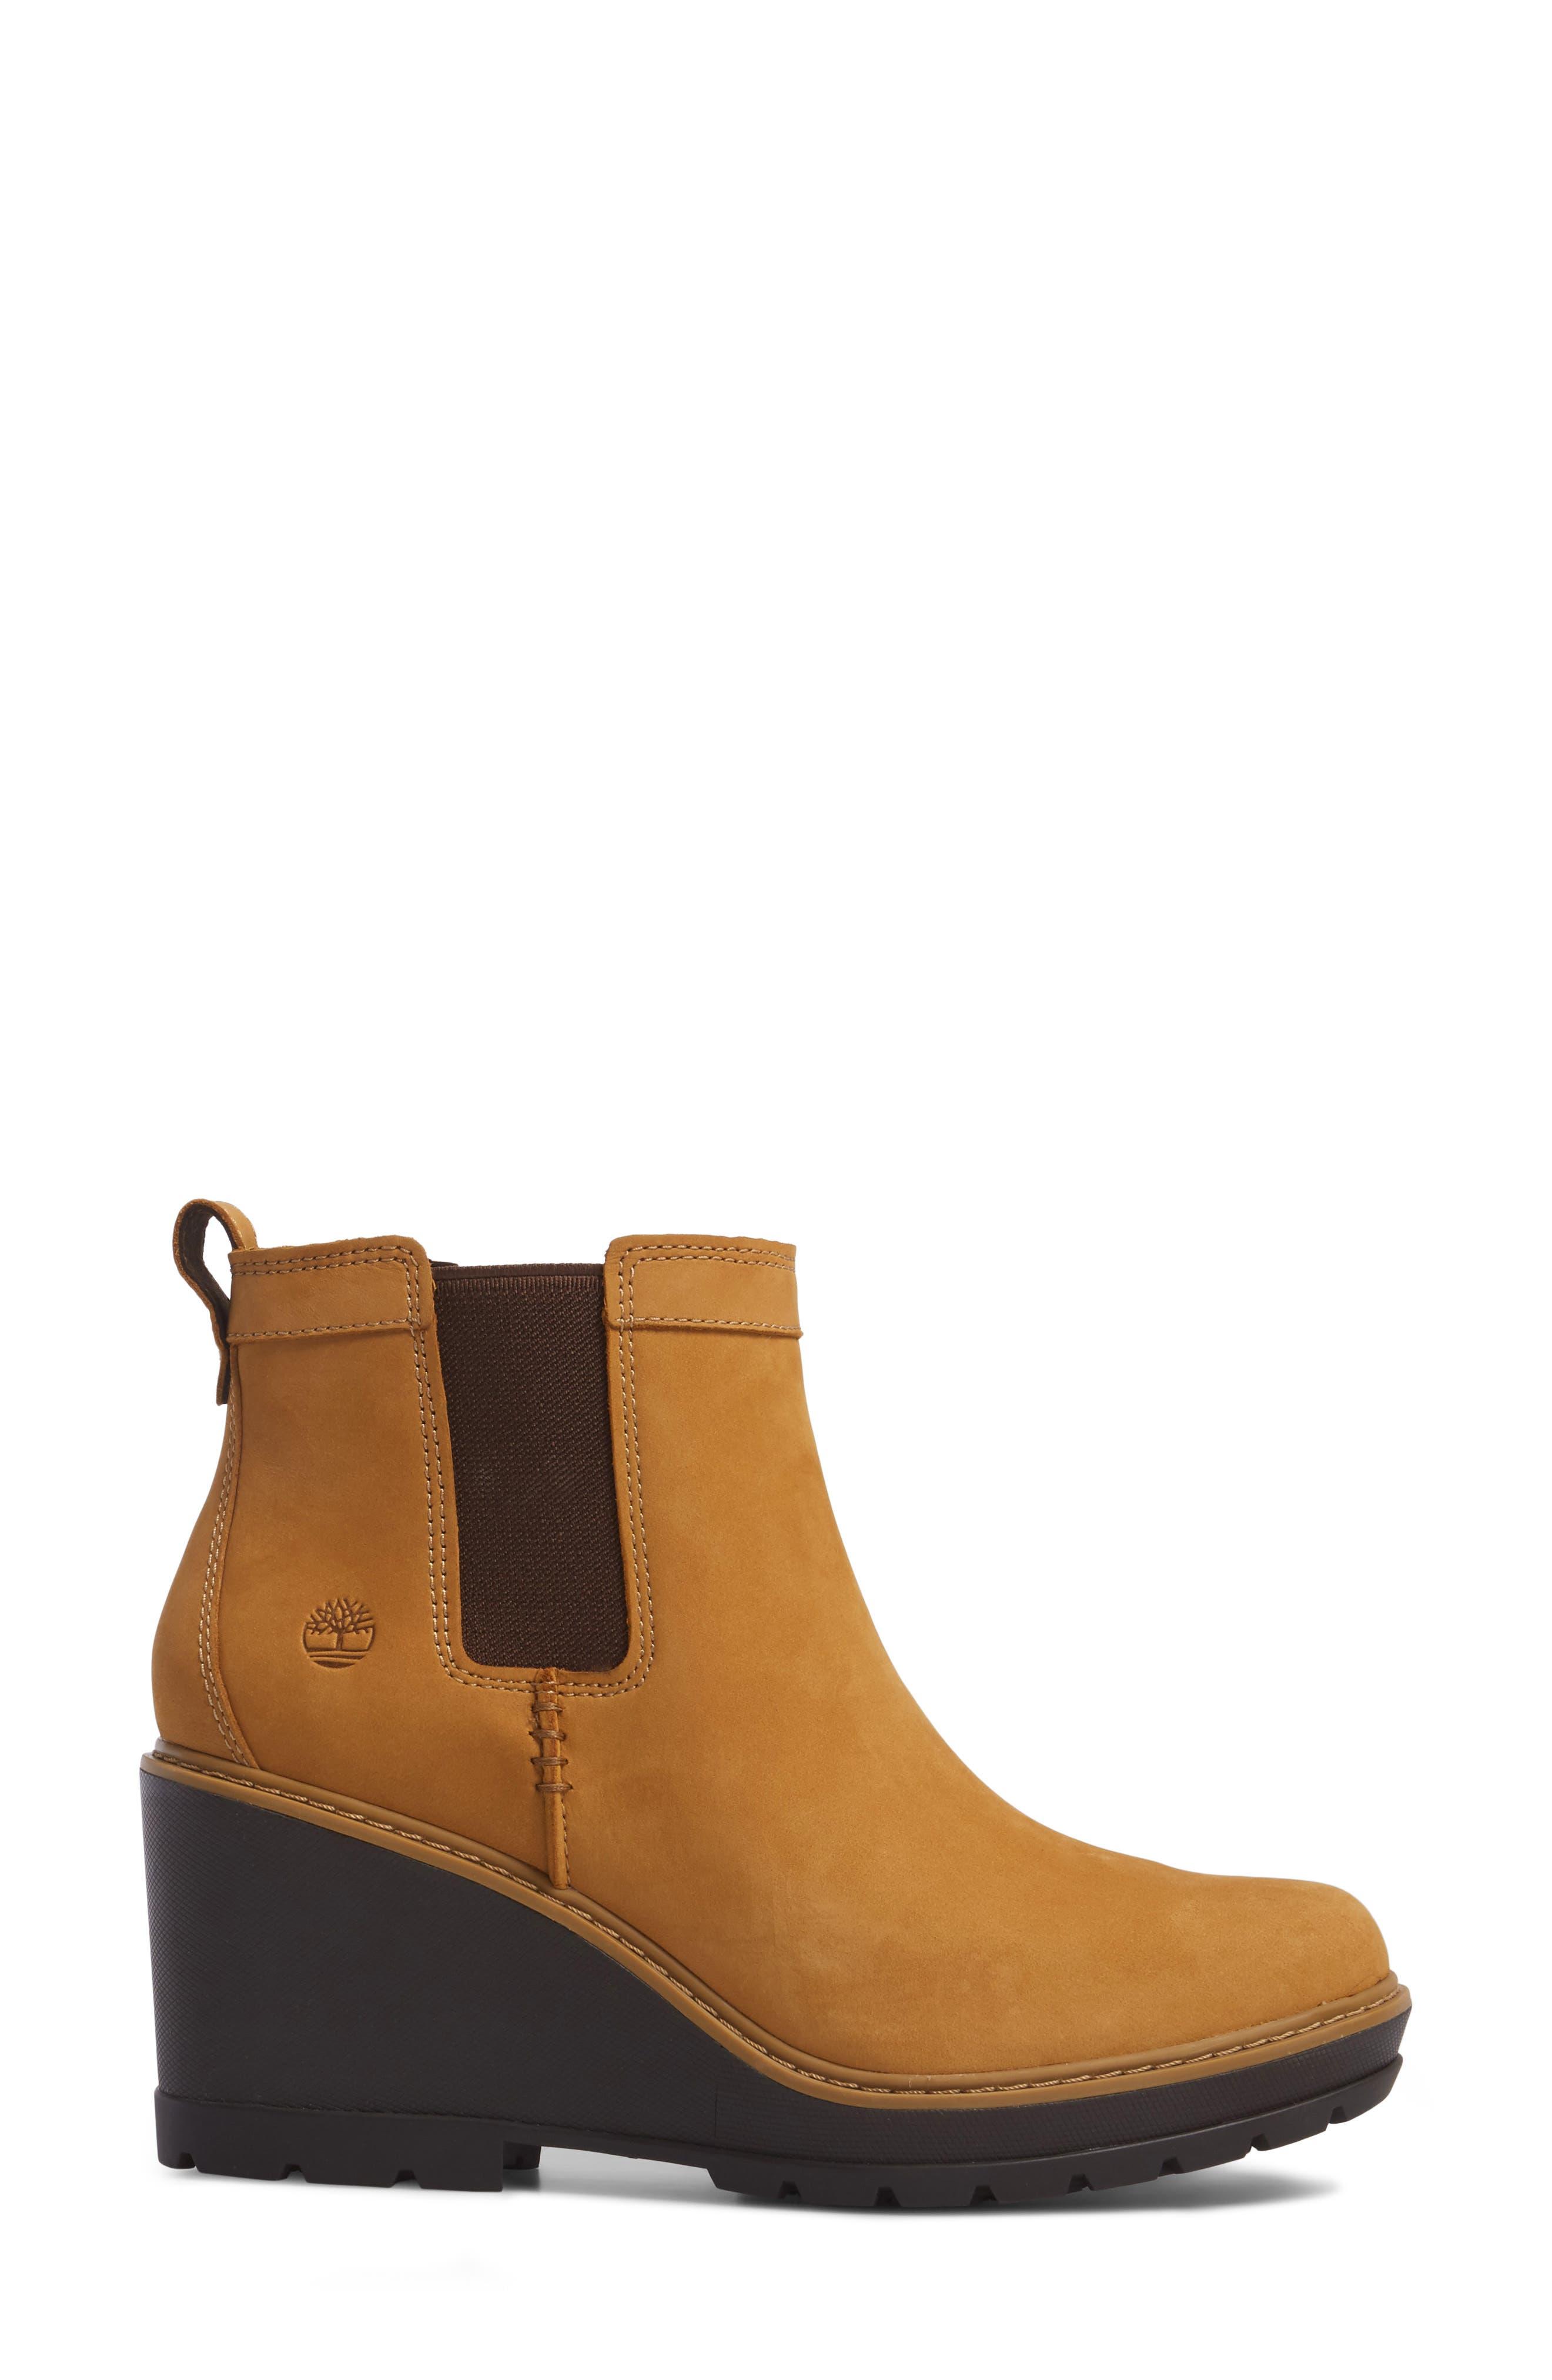 Kellis Water Resistant Chelsea Wedge Boot,                             Alternate thumbnail 3, color,                             211